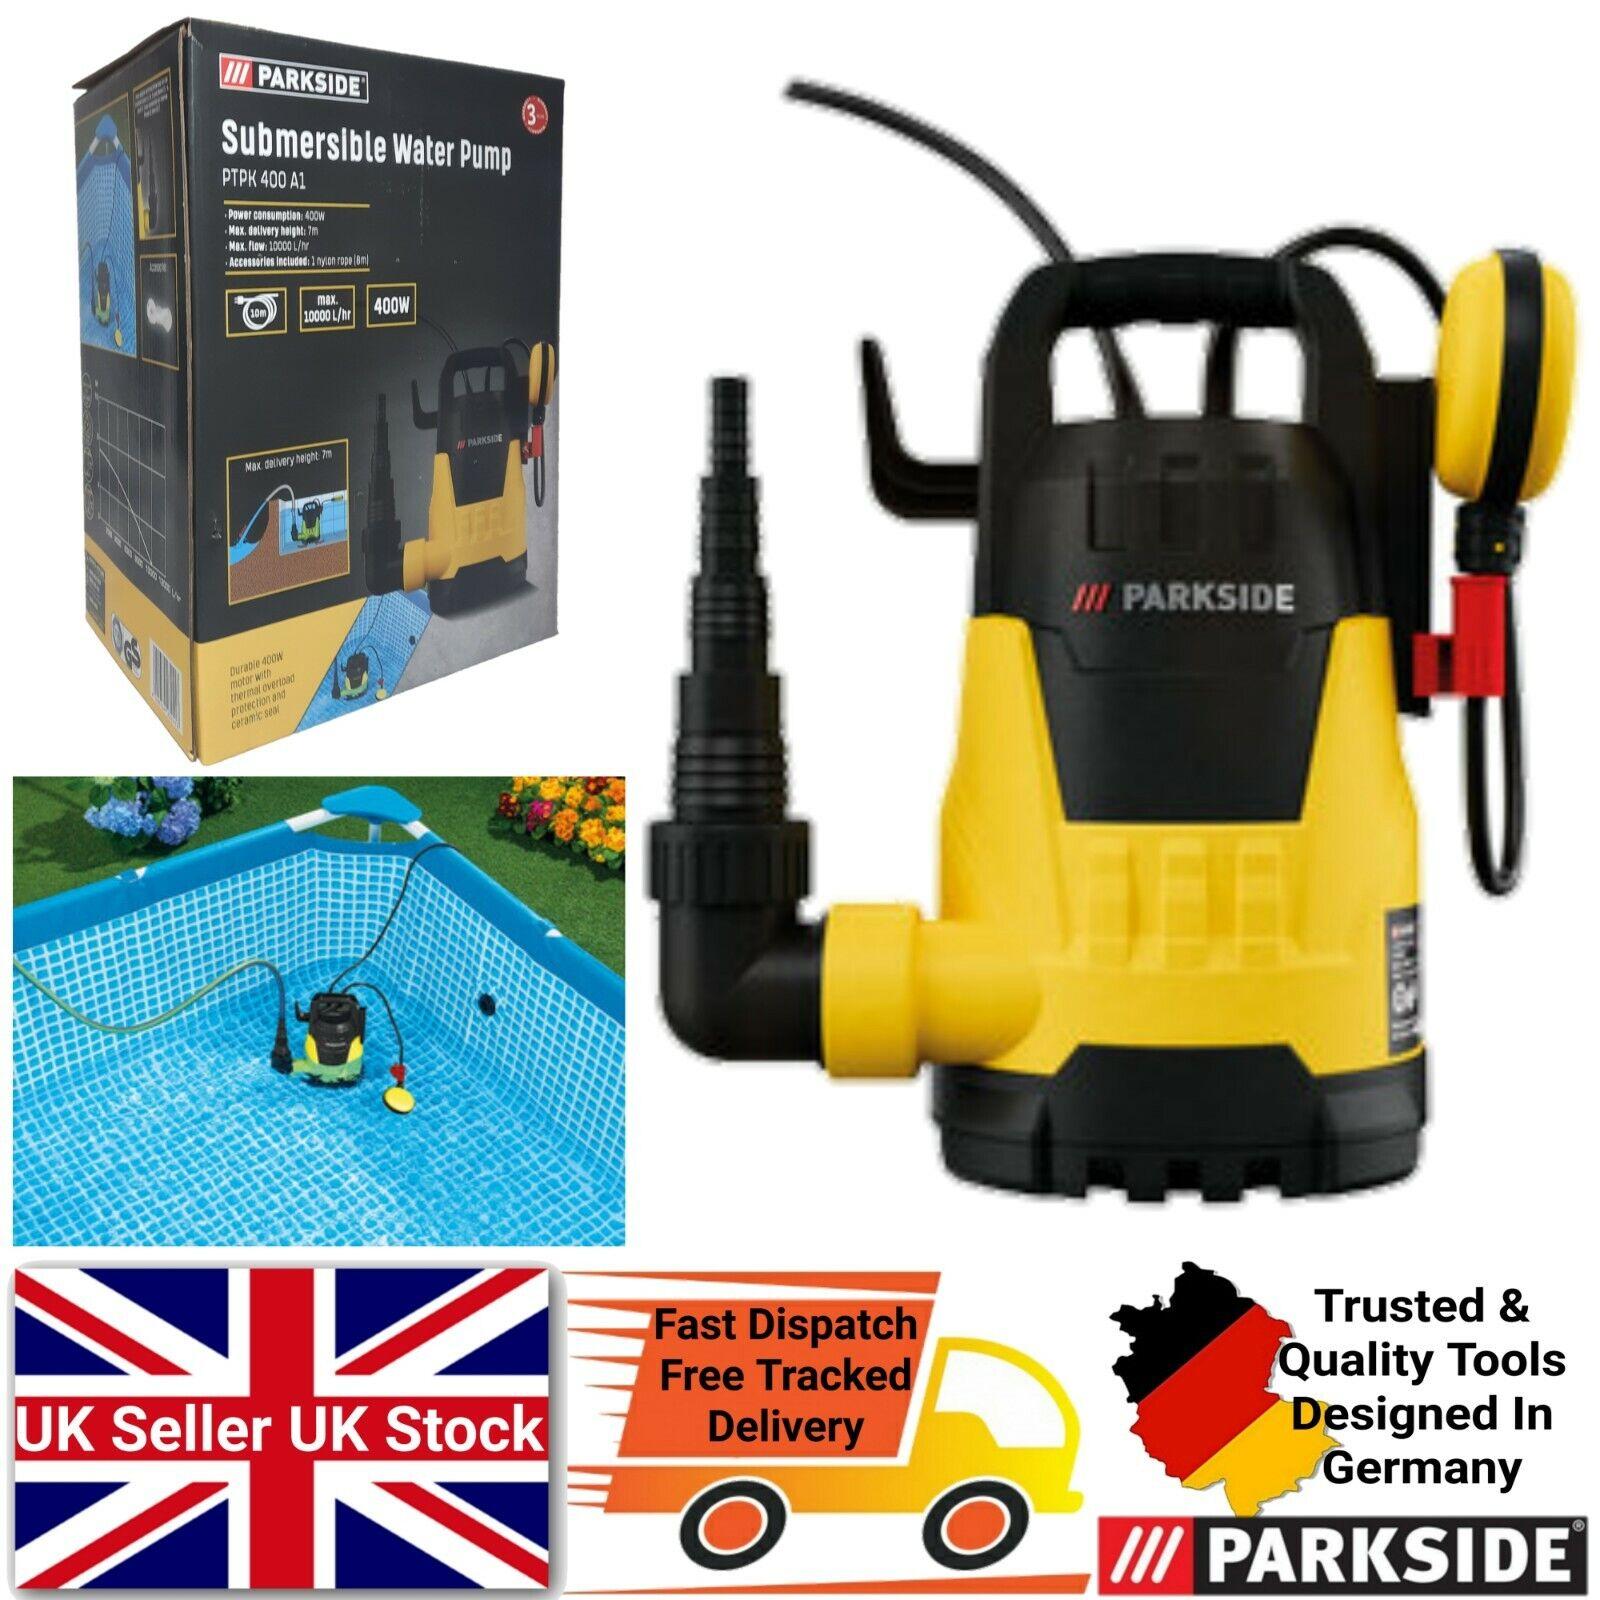 Parkside Submersible Water Pump Durable 400W Motor Draining Transferring Water